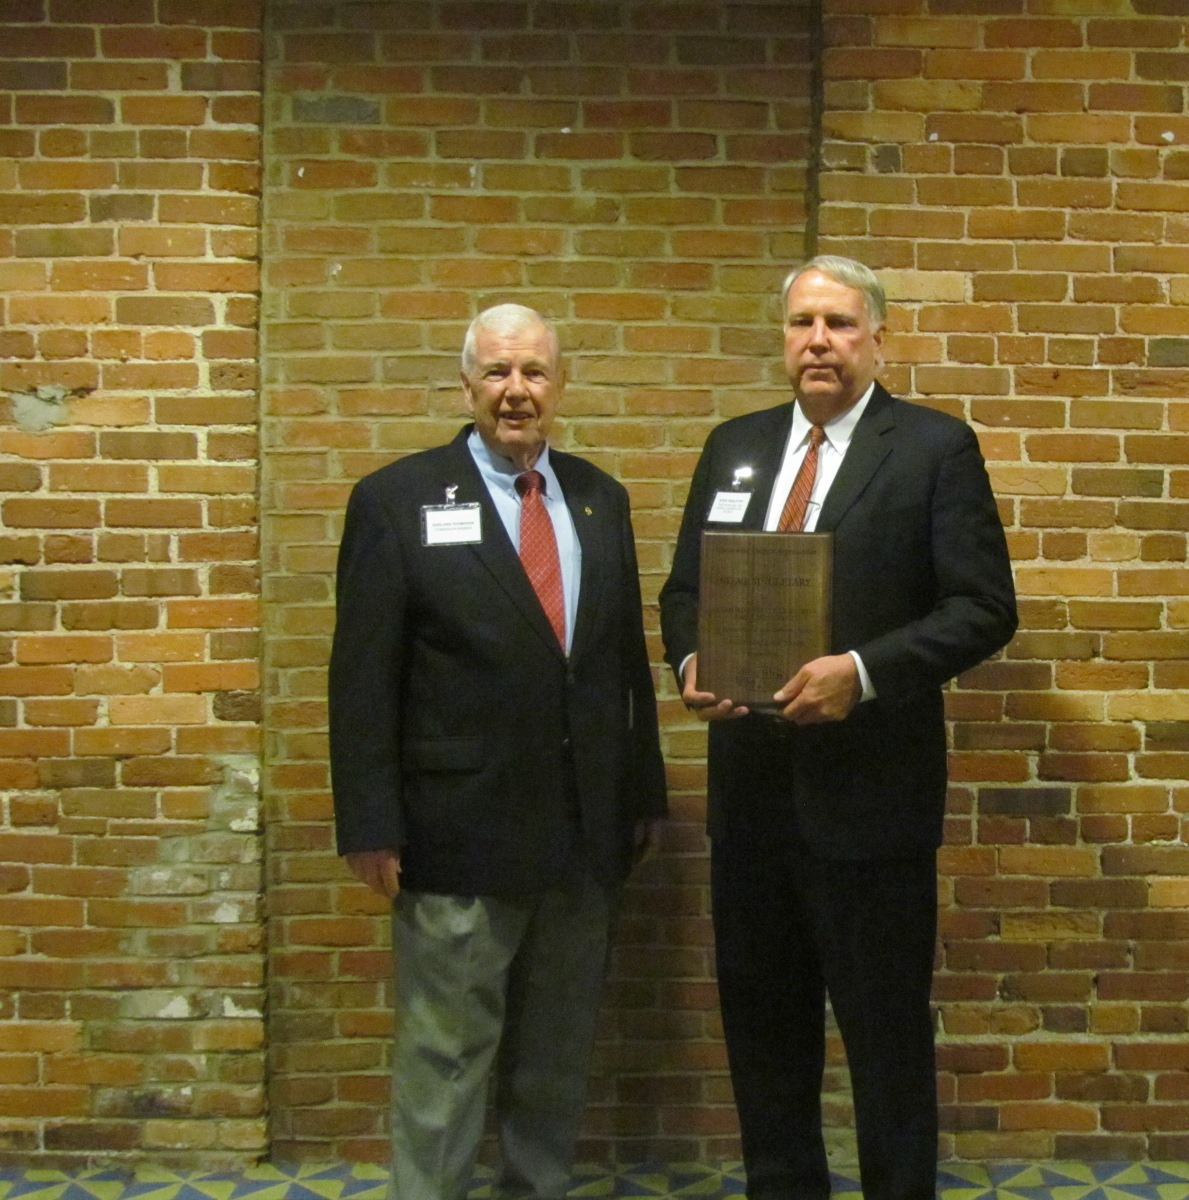 Mr. Steve Singletary (right) with GASWCC Chairman Mr. Garland Thompson (left)